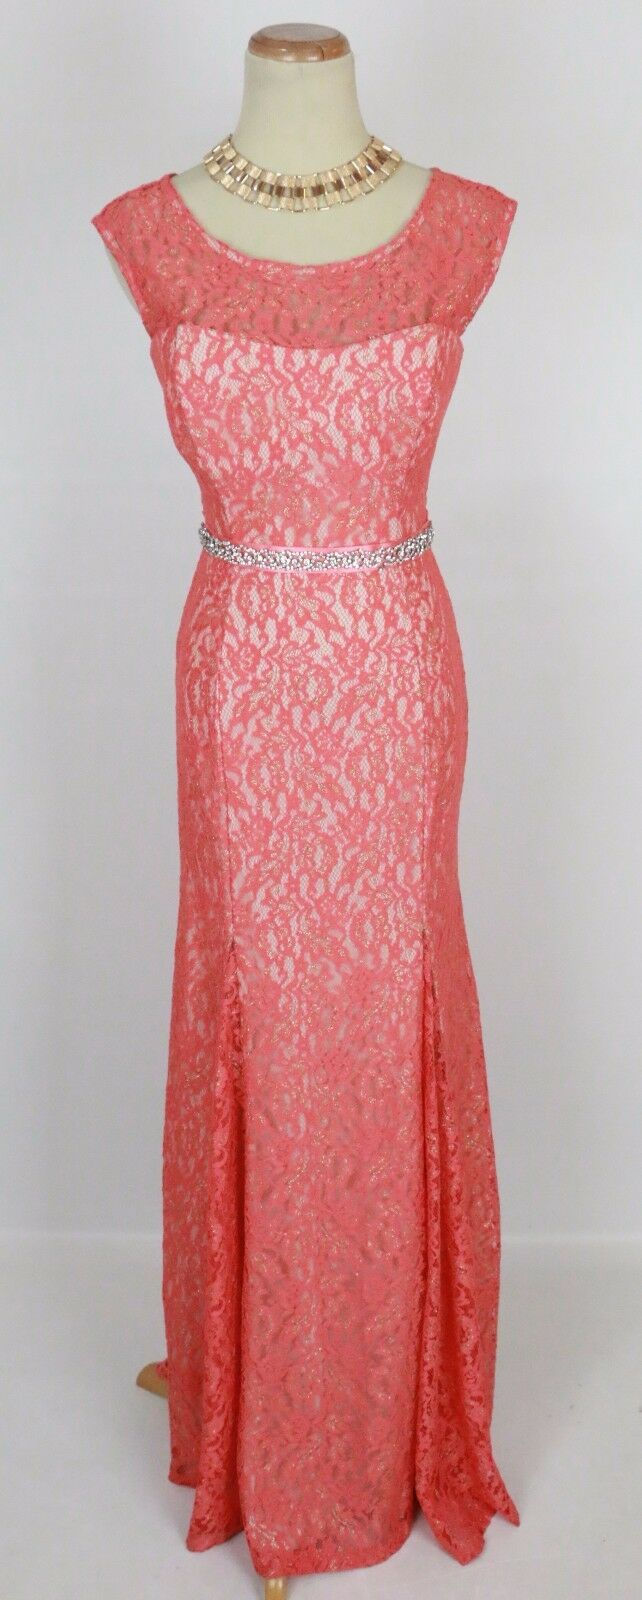 Sequin Heart Full Length Junior Cocktail Prom Formal Cruise Dress Größe 3 Orange